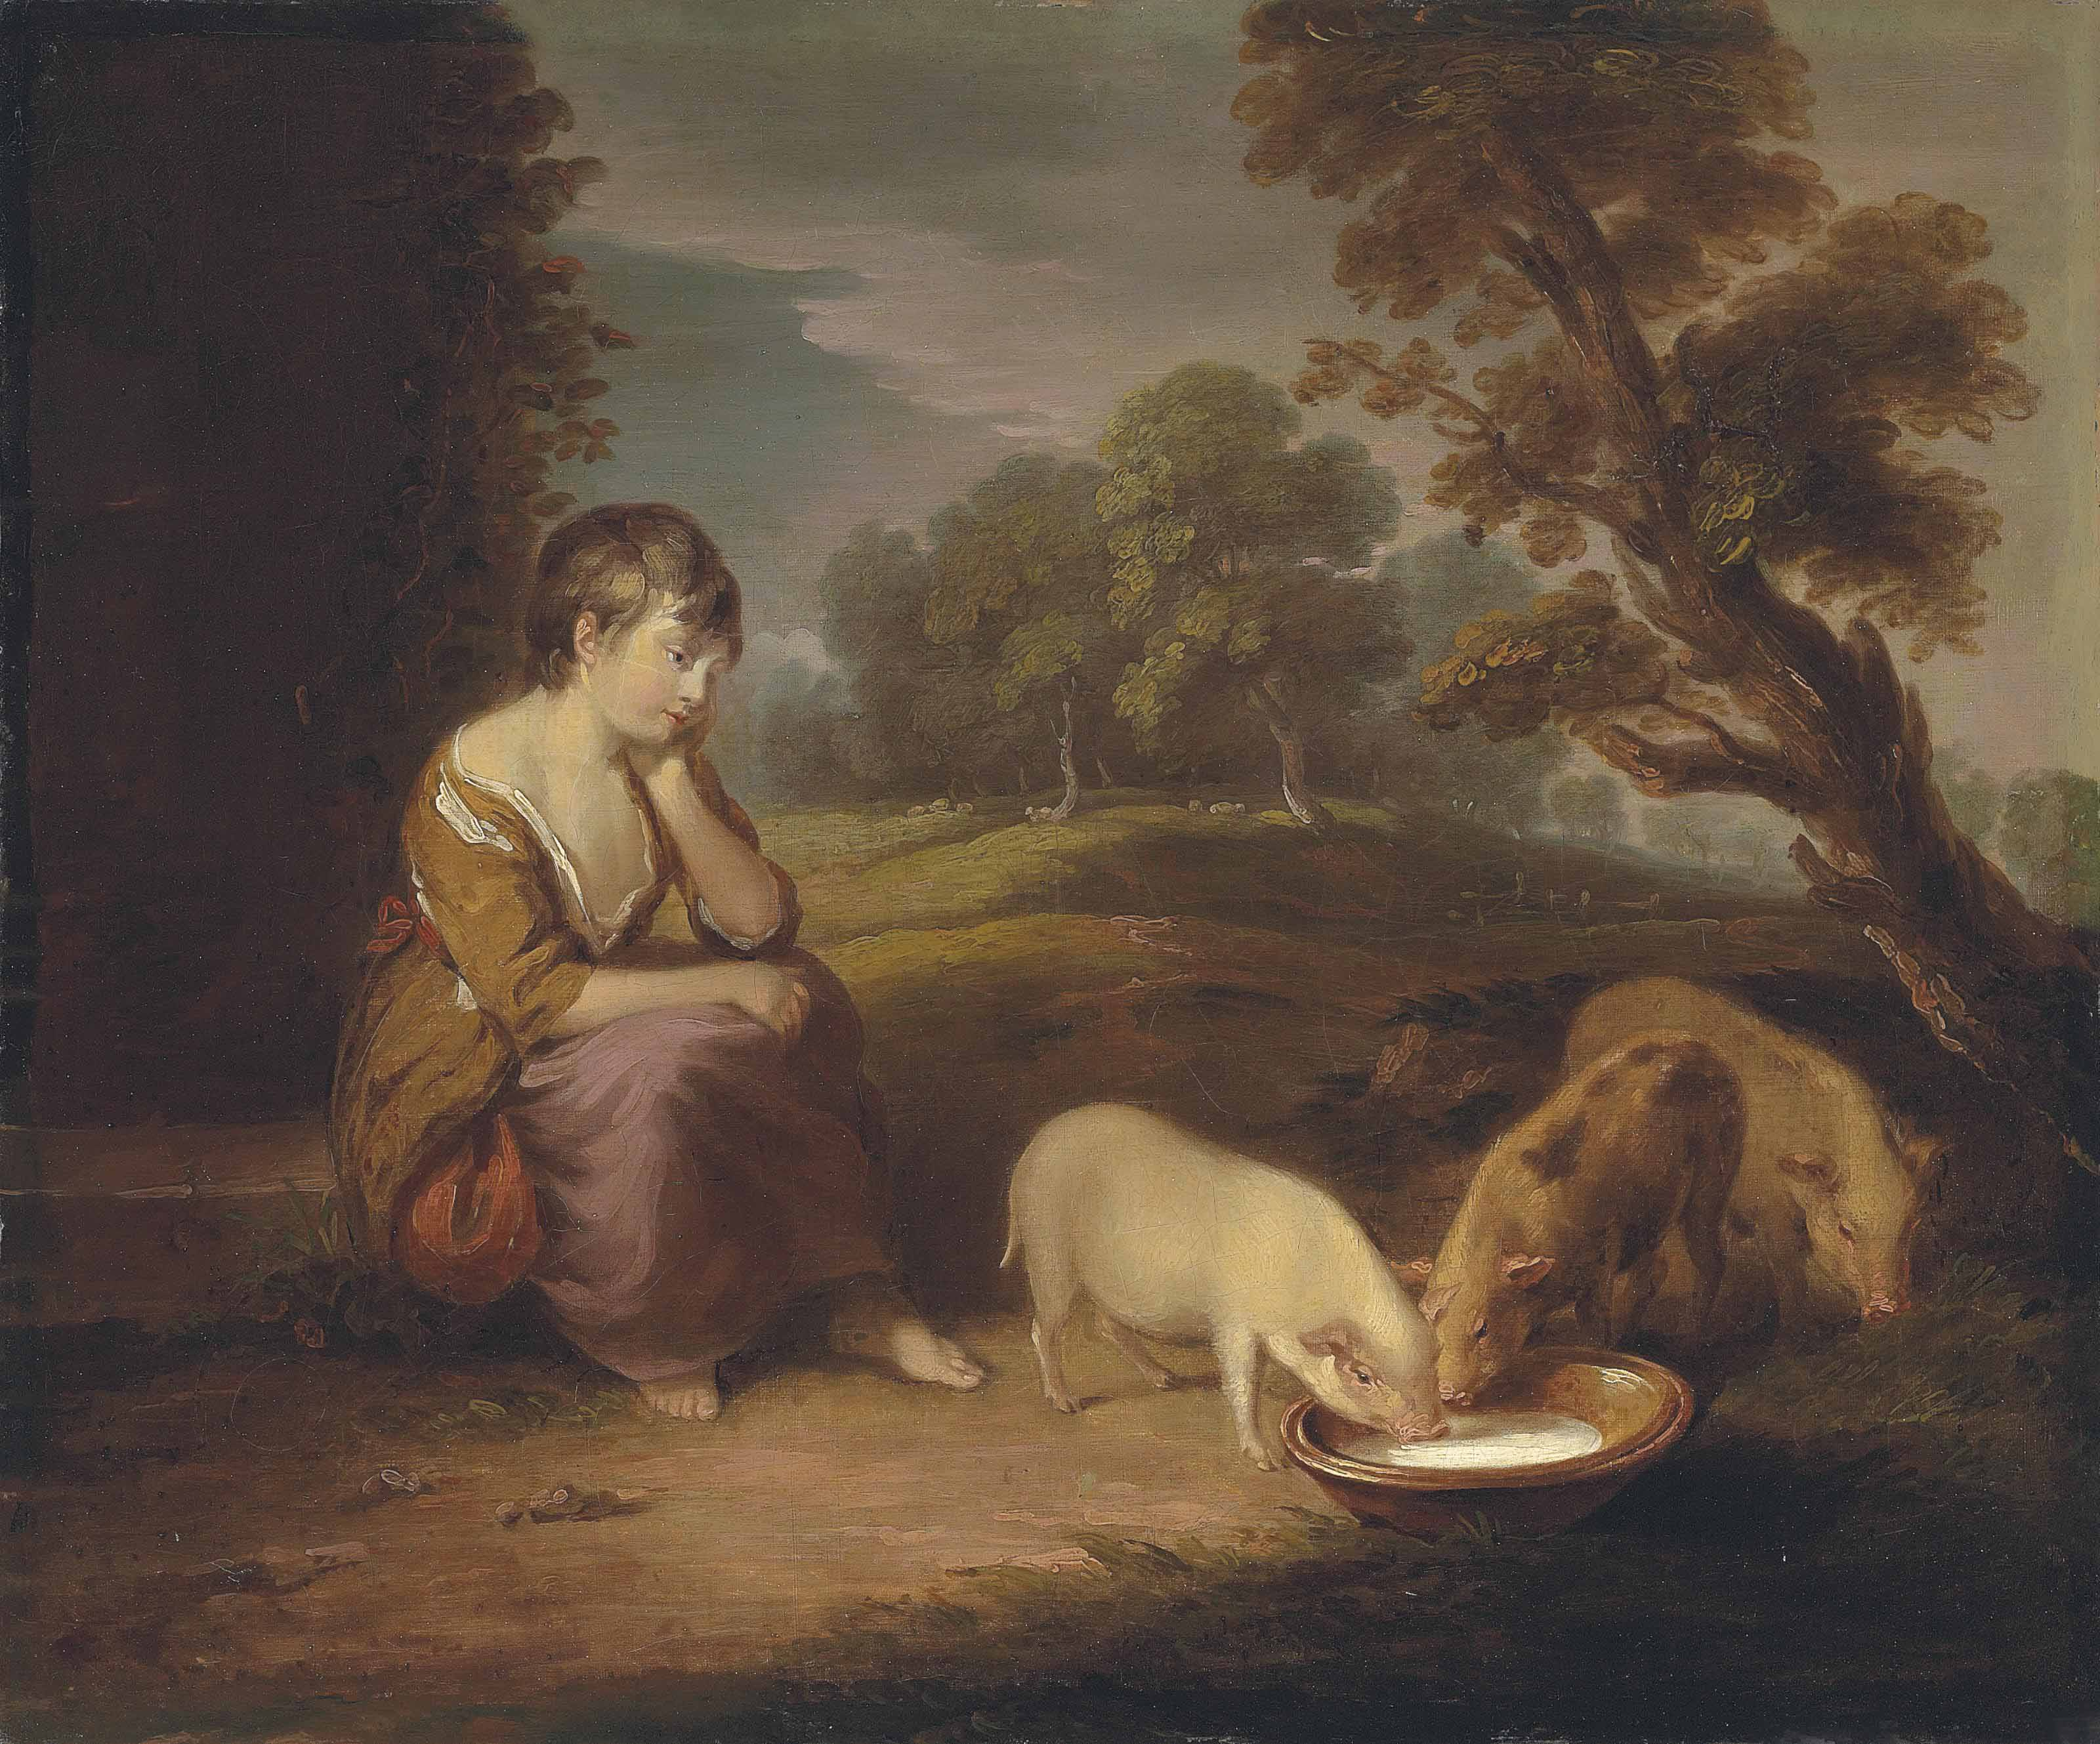 After Thomas Gainsborough, R.A.